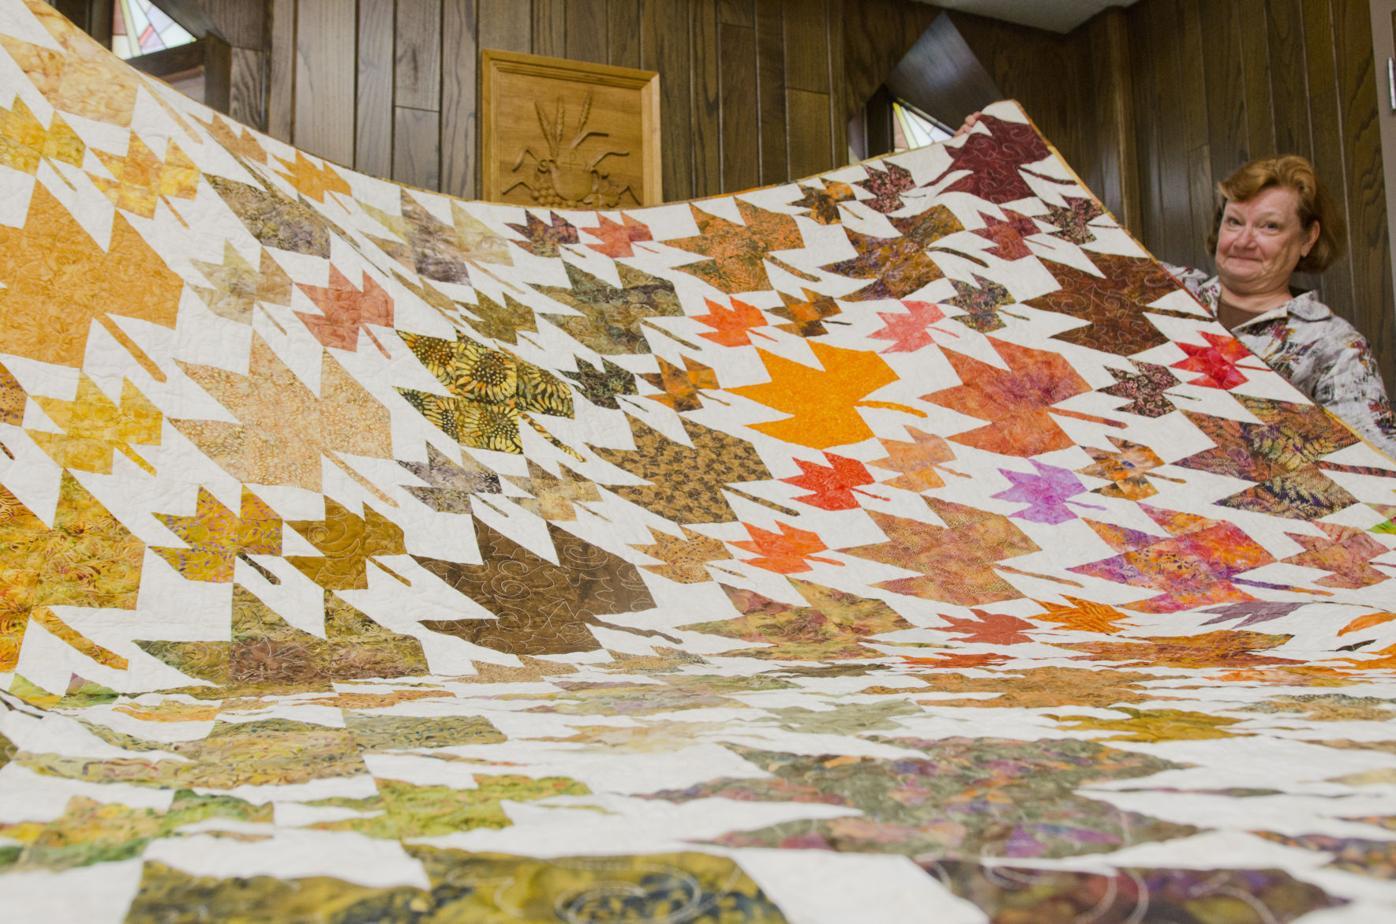 Raffled quilt